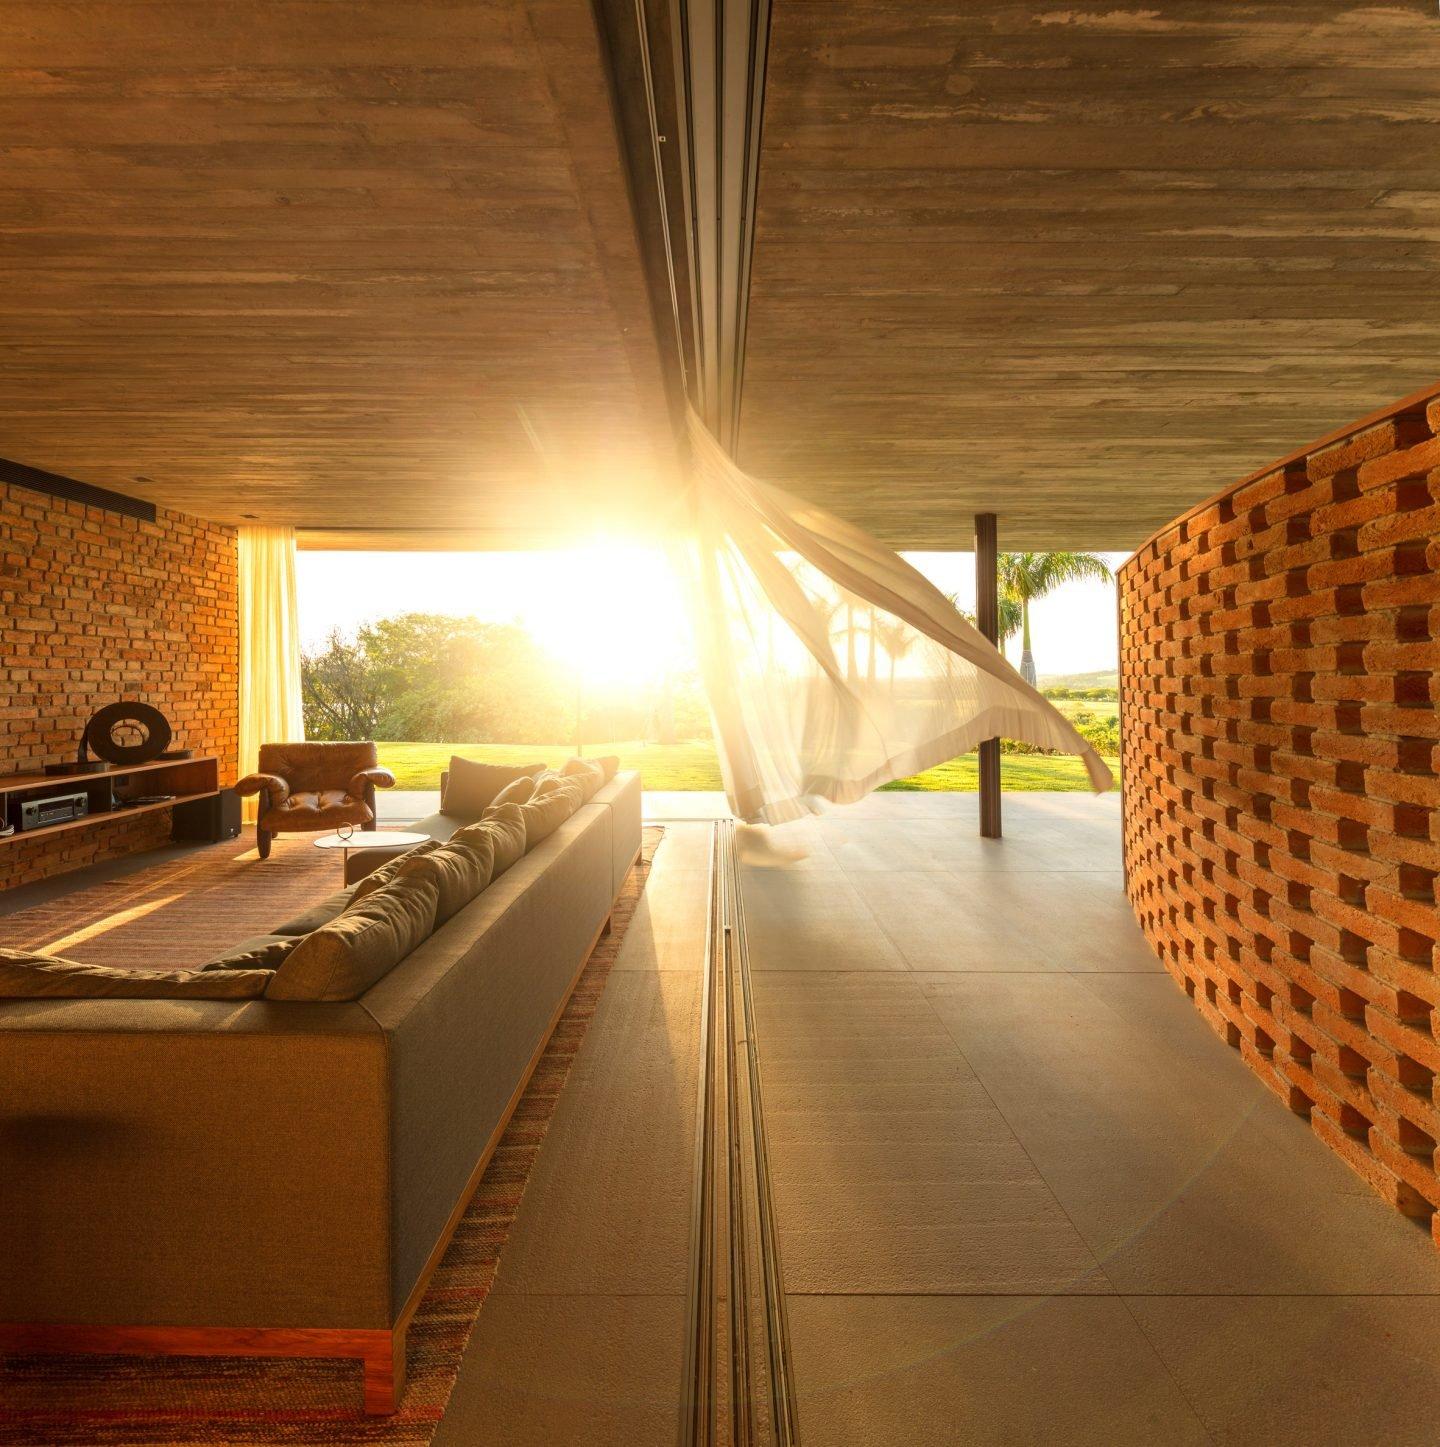 iGNANT-Architecture-Studio-MK27-Planar-House-027